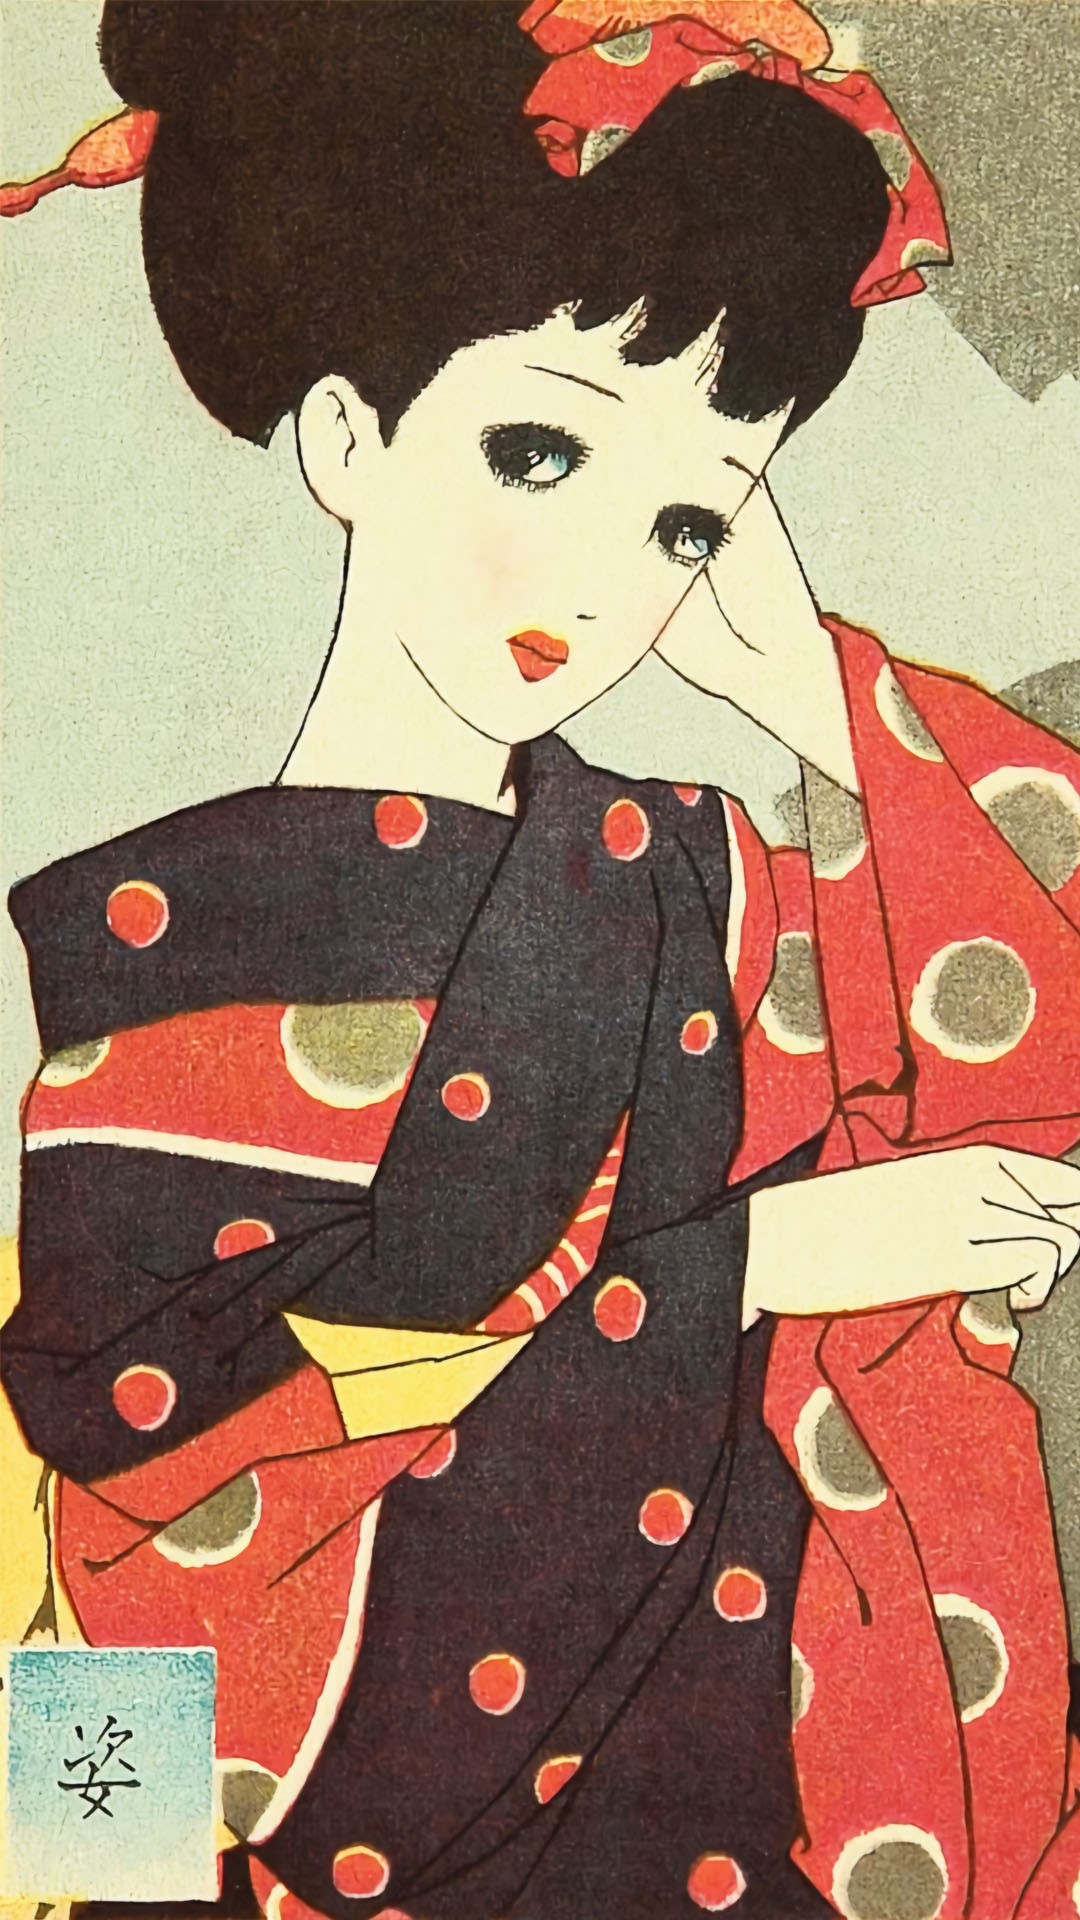 Nakahara Junichi - Sugata 1080x1920